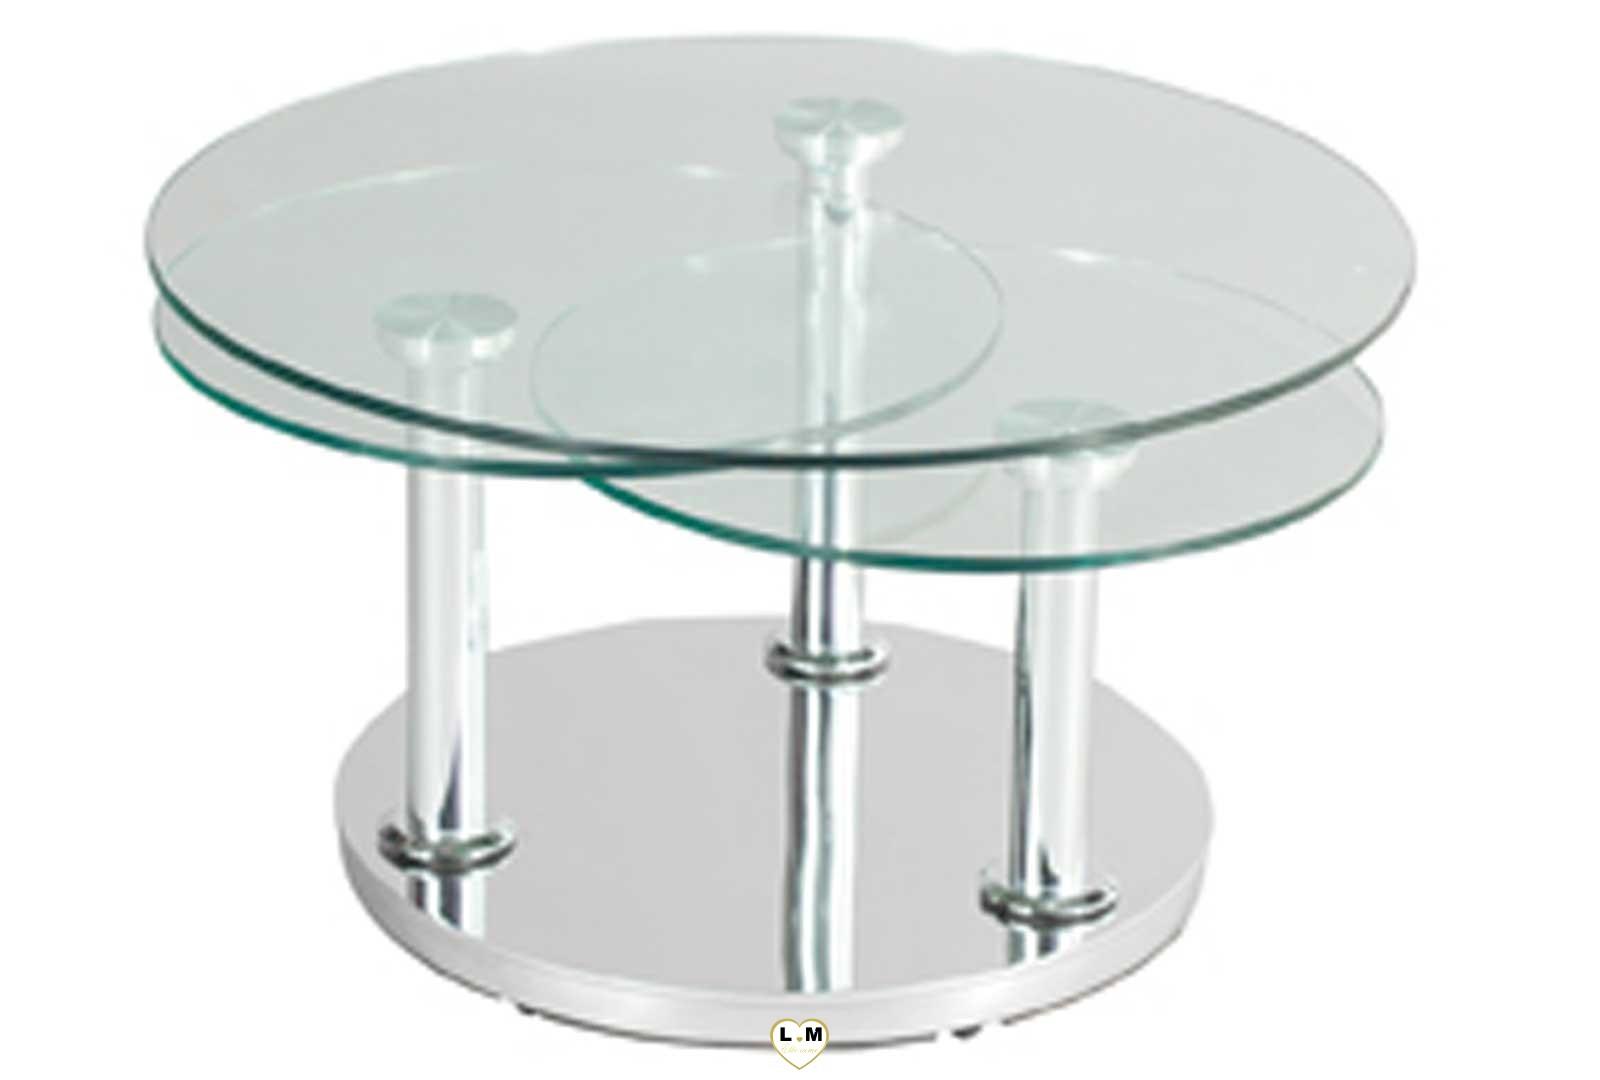 Montparnasse chrome silver table basse verre articulee lignemeuble com - Table basse pied chrome ...